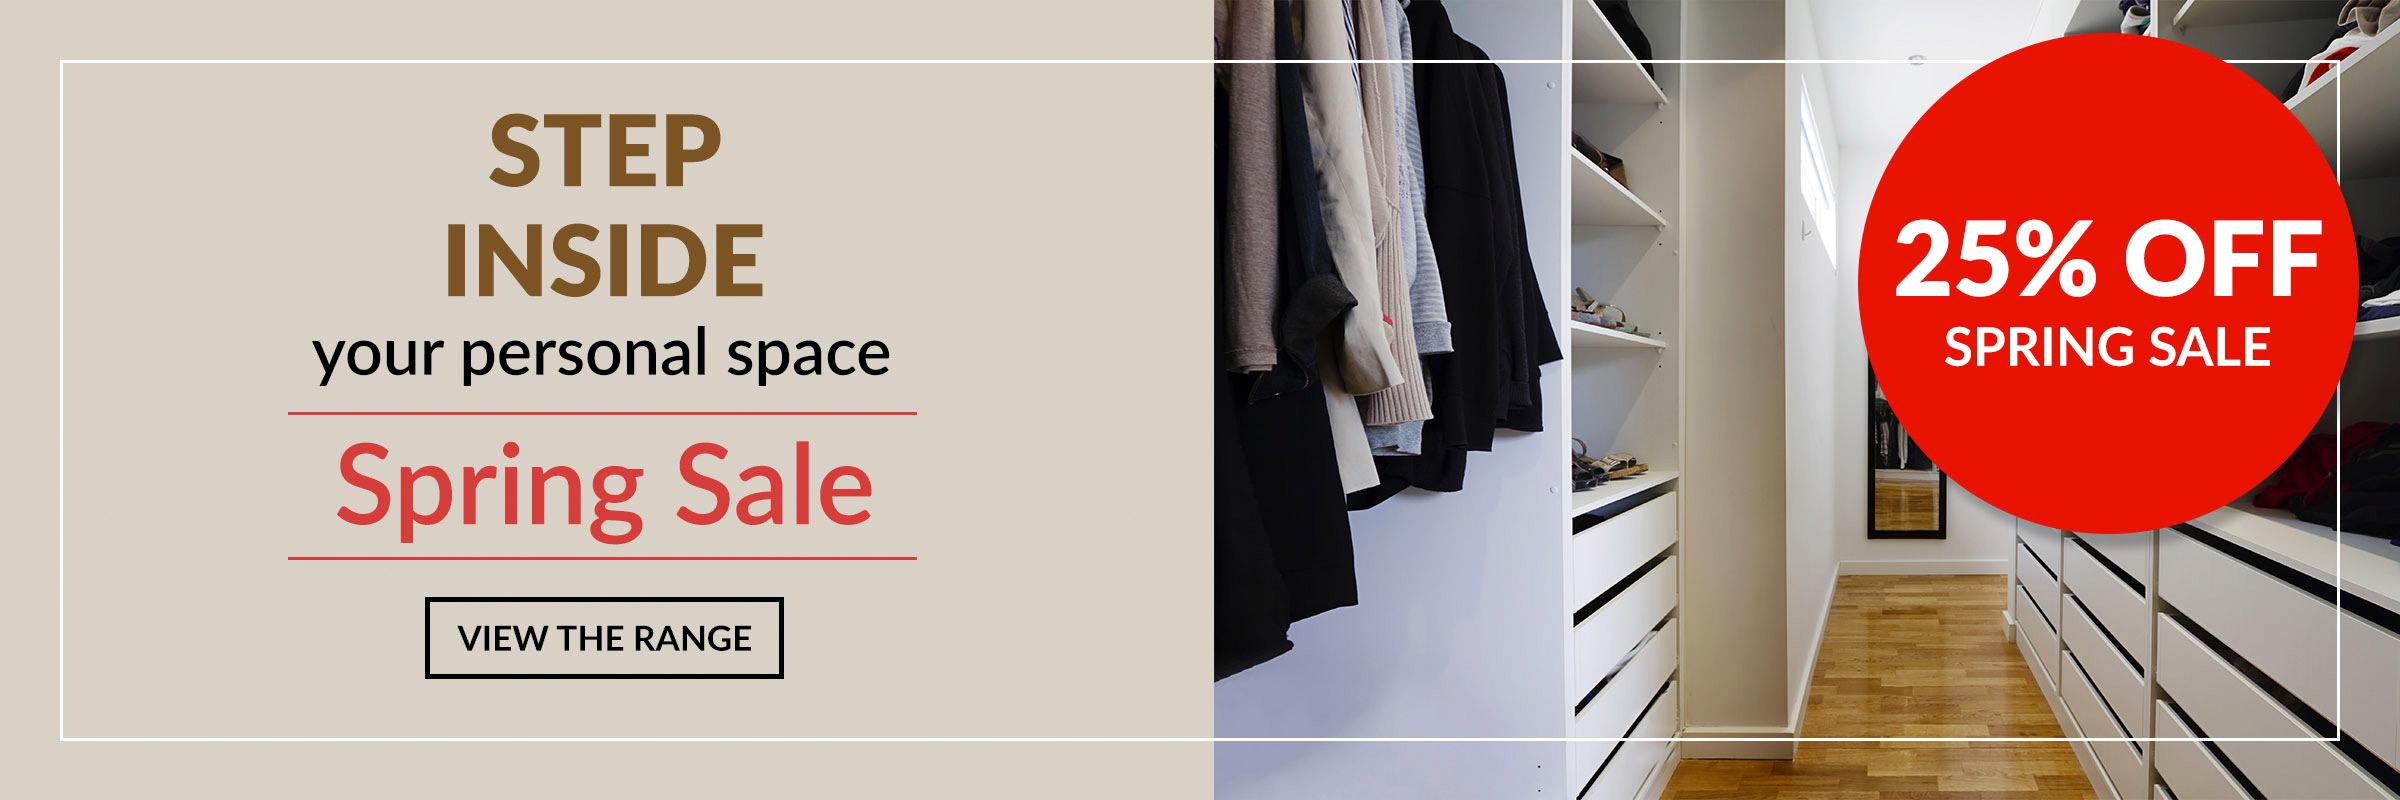 walk-in-wardrobes-ss25